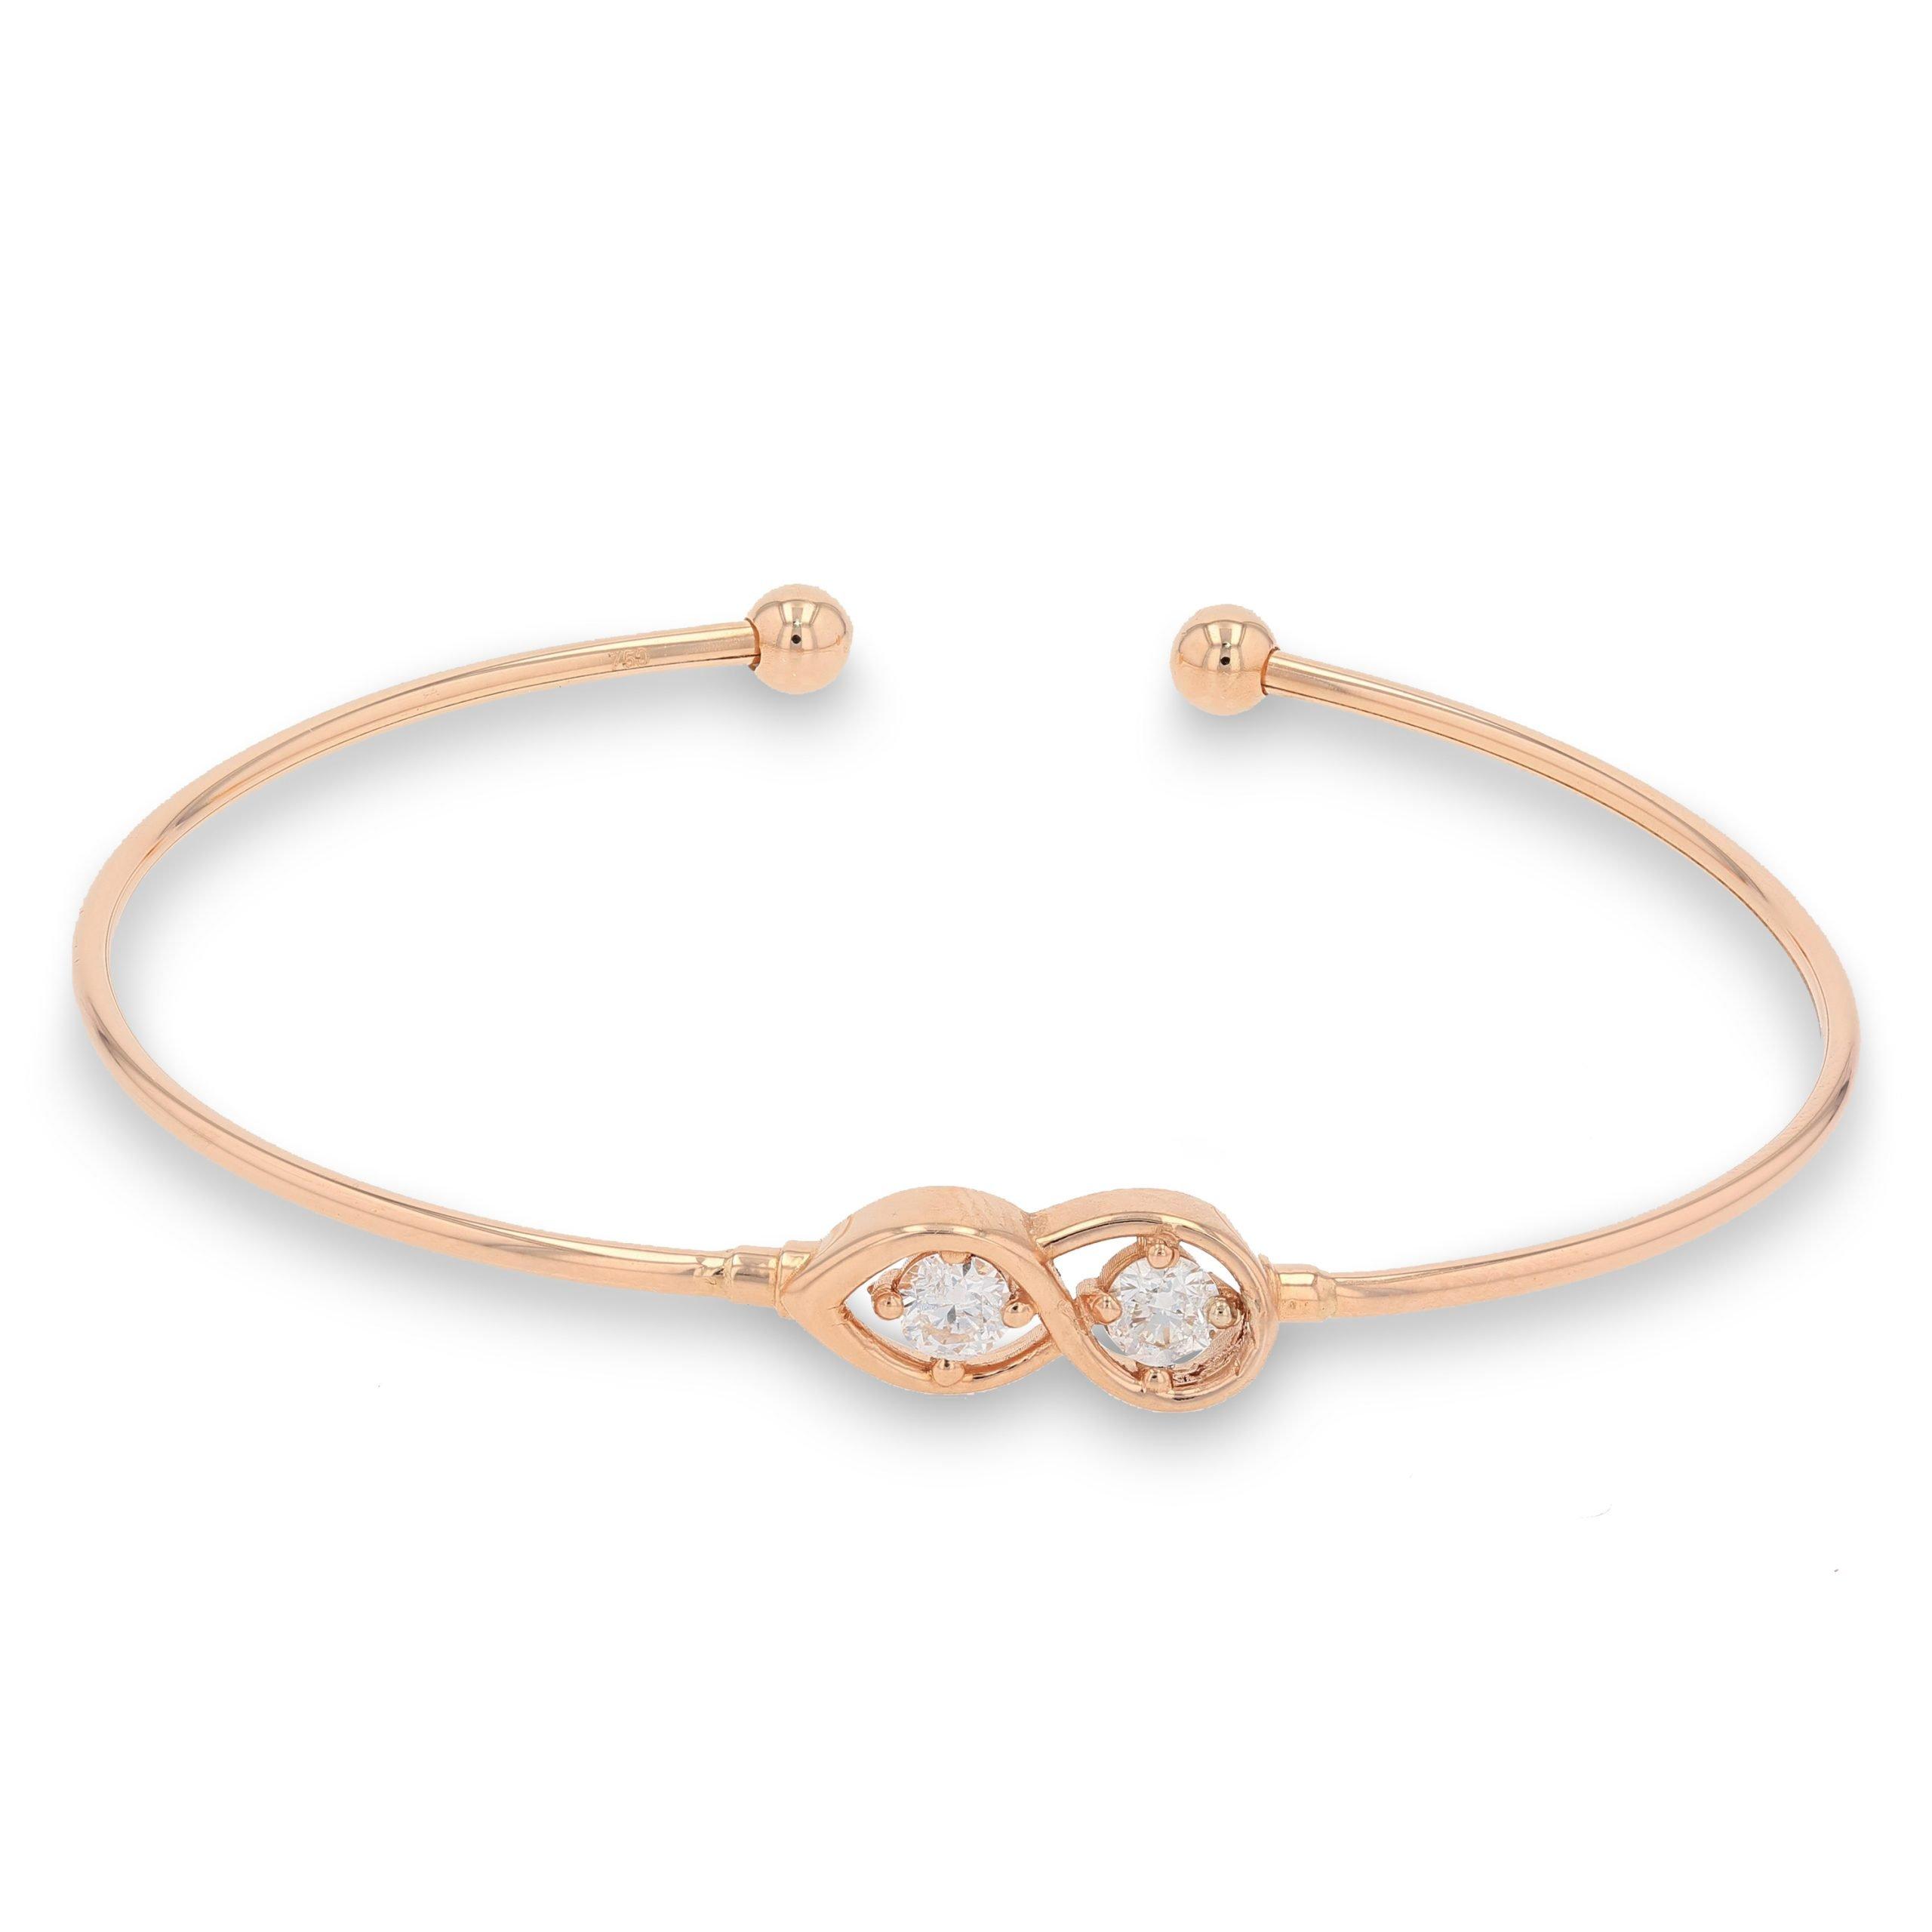 ROSE GOLD INFINITY DIAMOND BANGLE